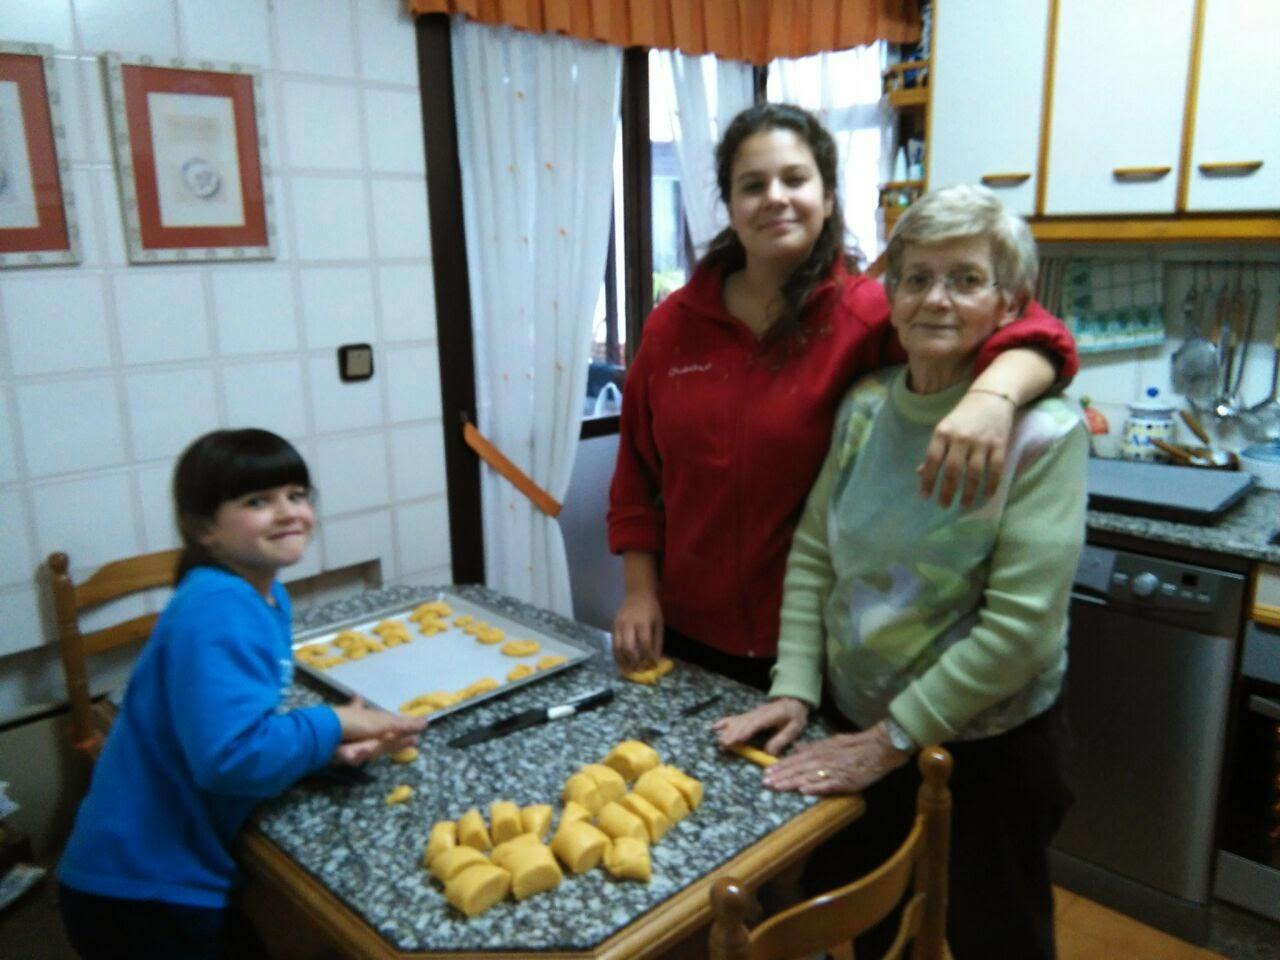 Chelo Álvarez García y sus nietas Gara e Iria, haciendo marañuelas. Abril 2015. Foto Cristina Negro Álvarez